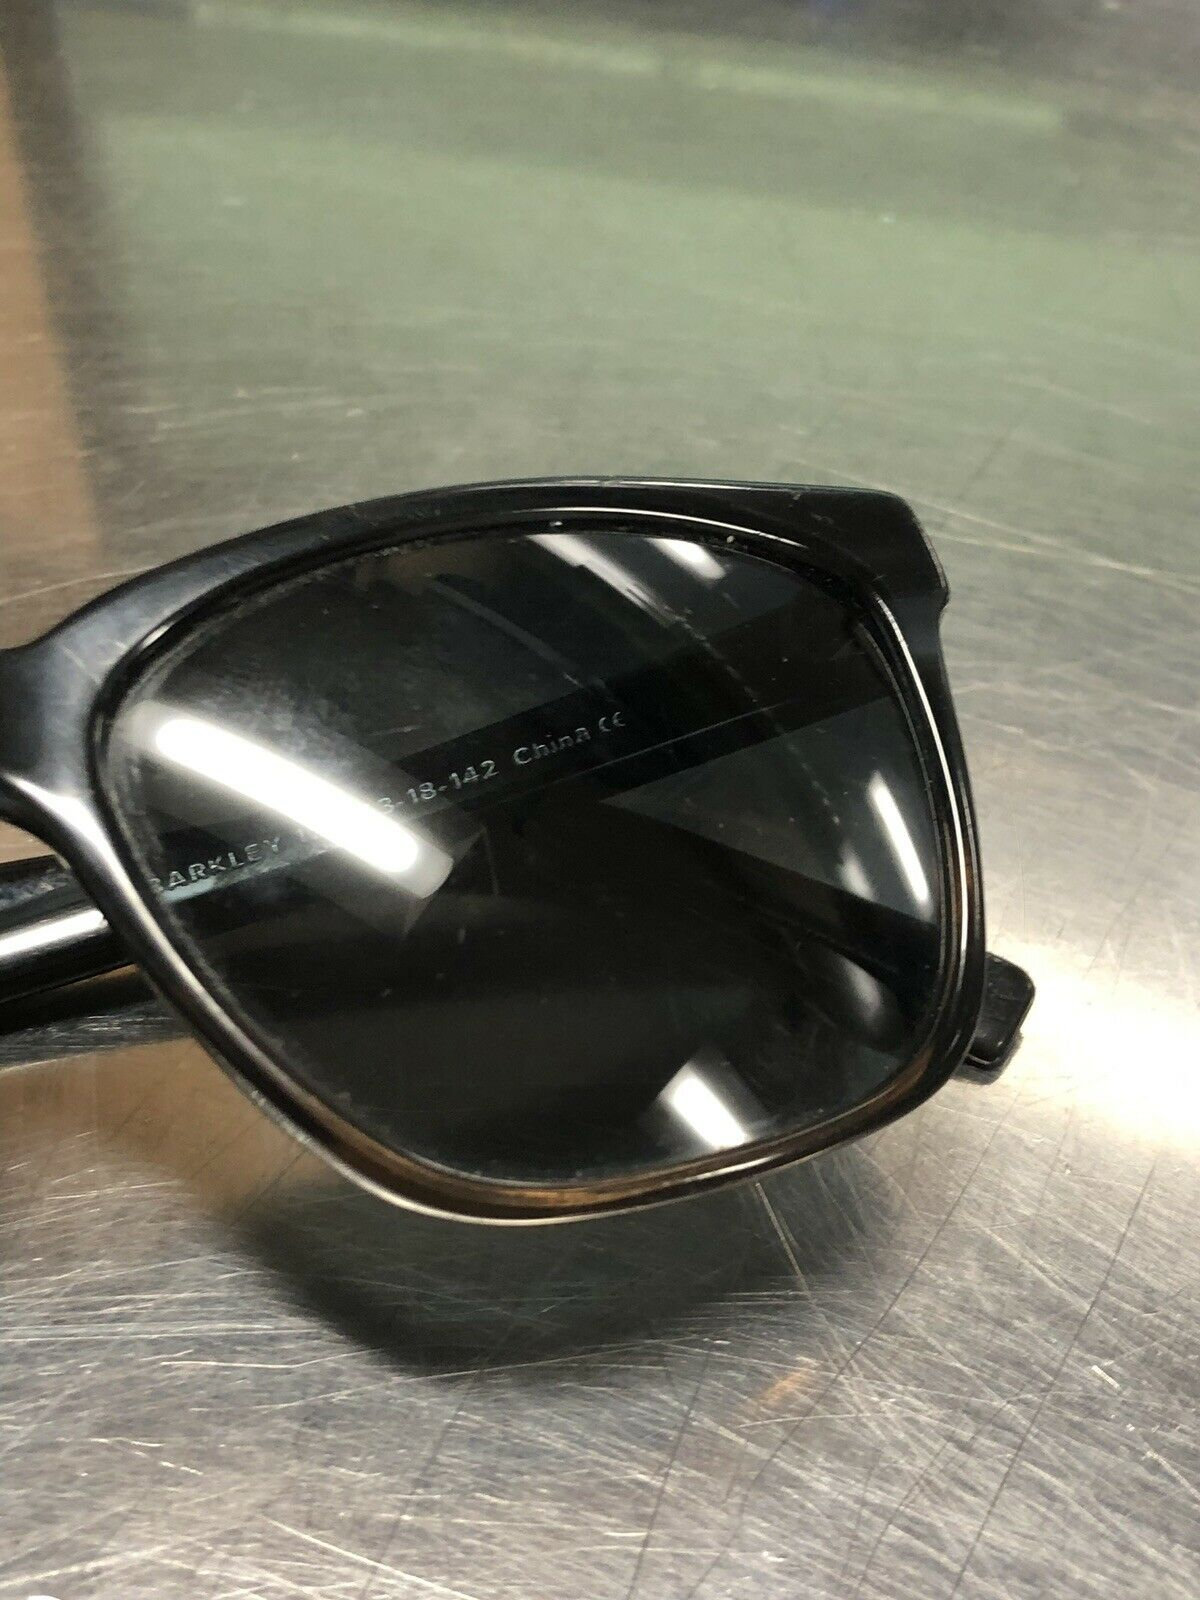 Warby Parker Barkley 125 Polarized Sunglasses - image 3